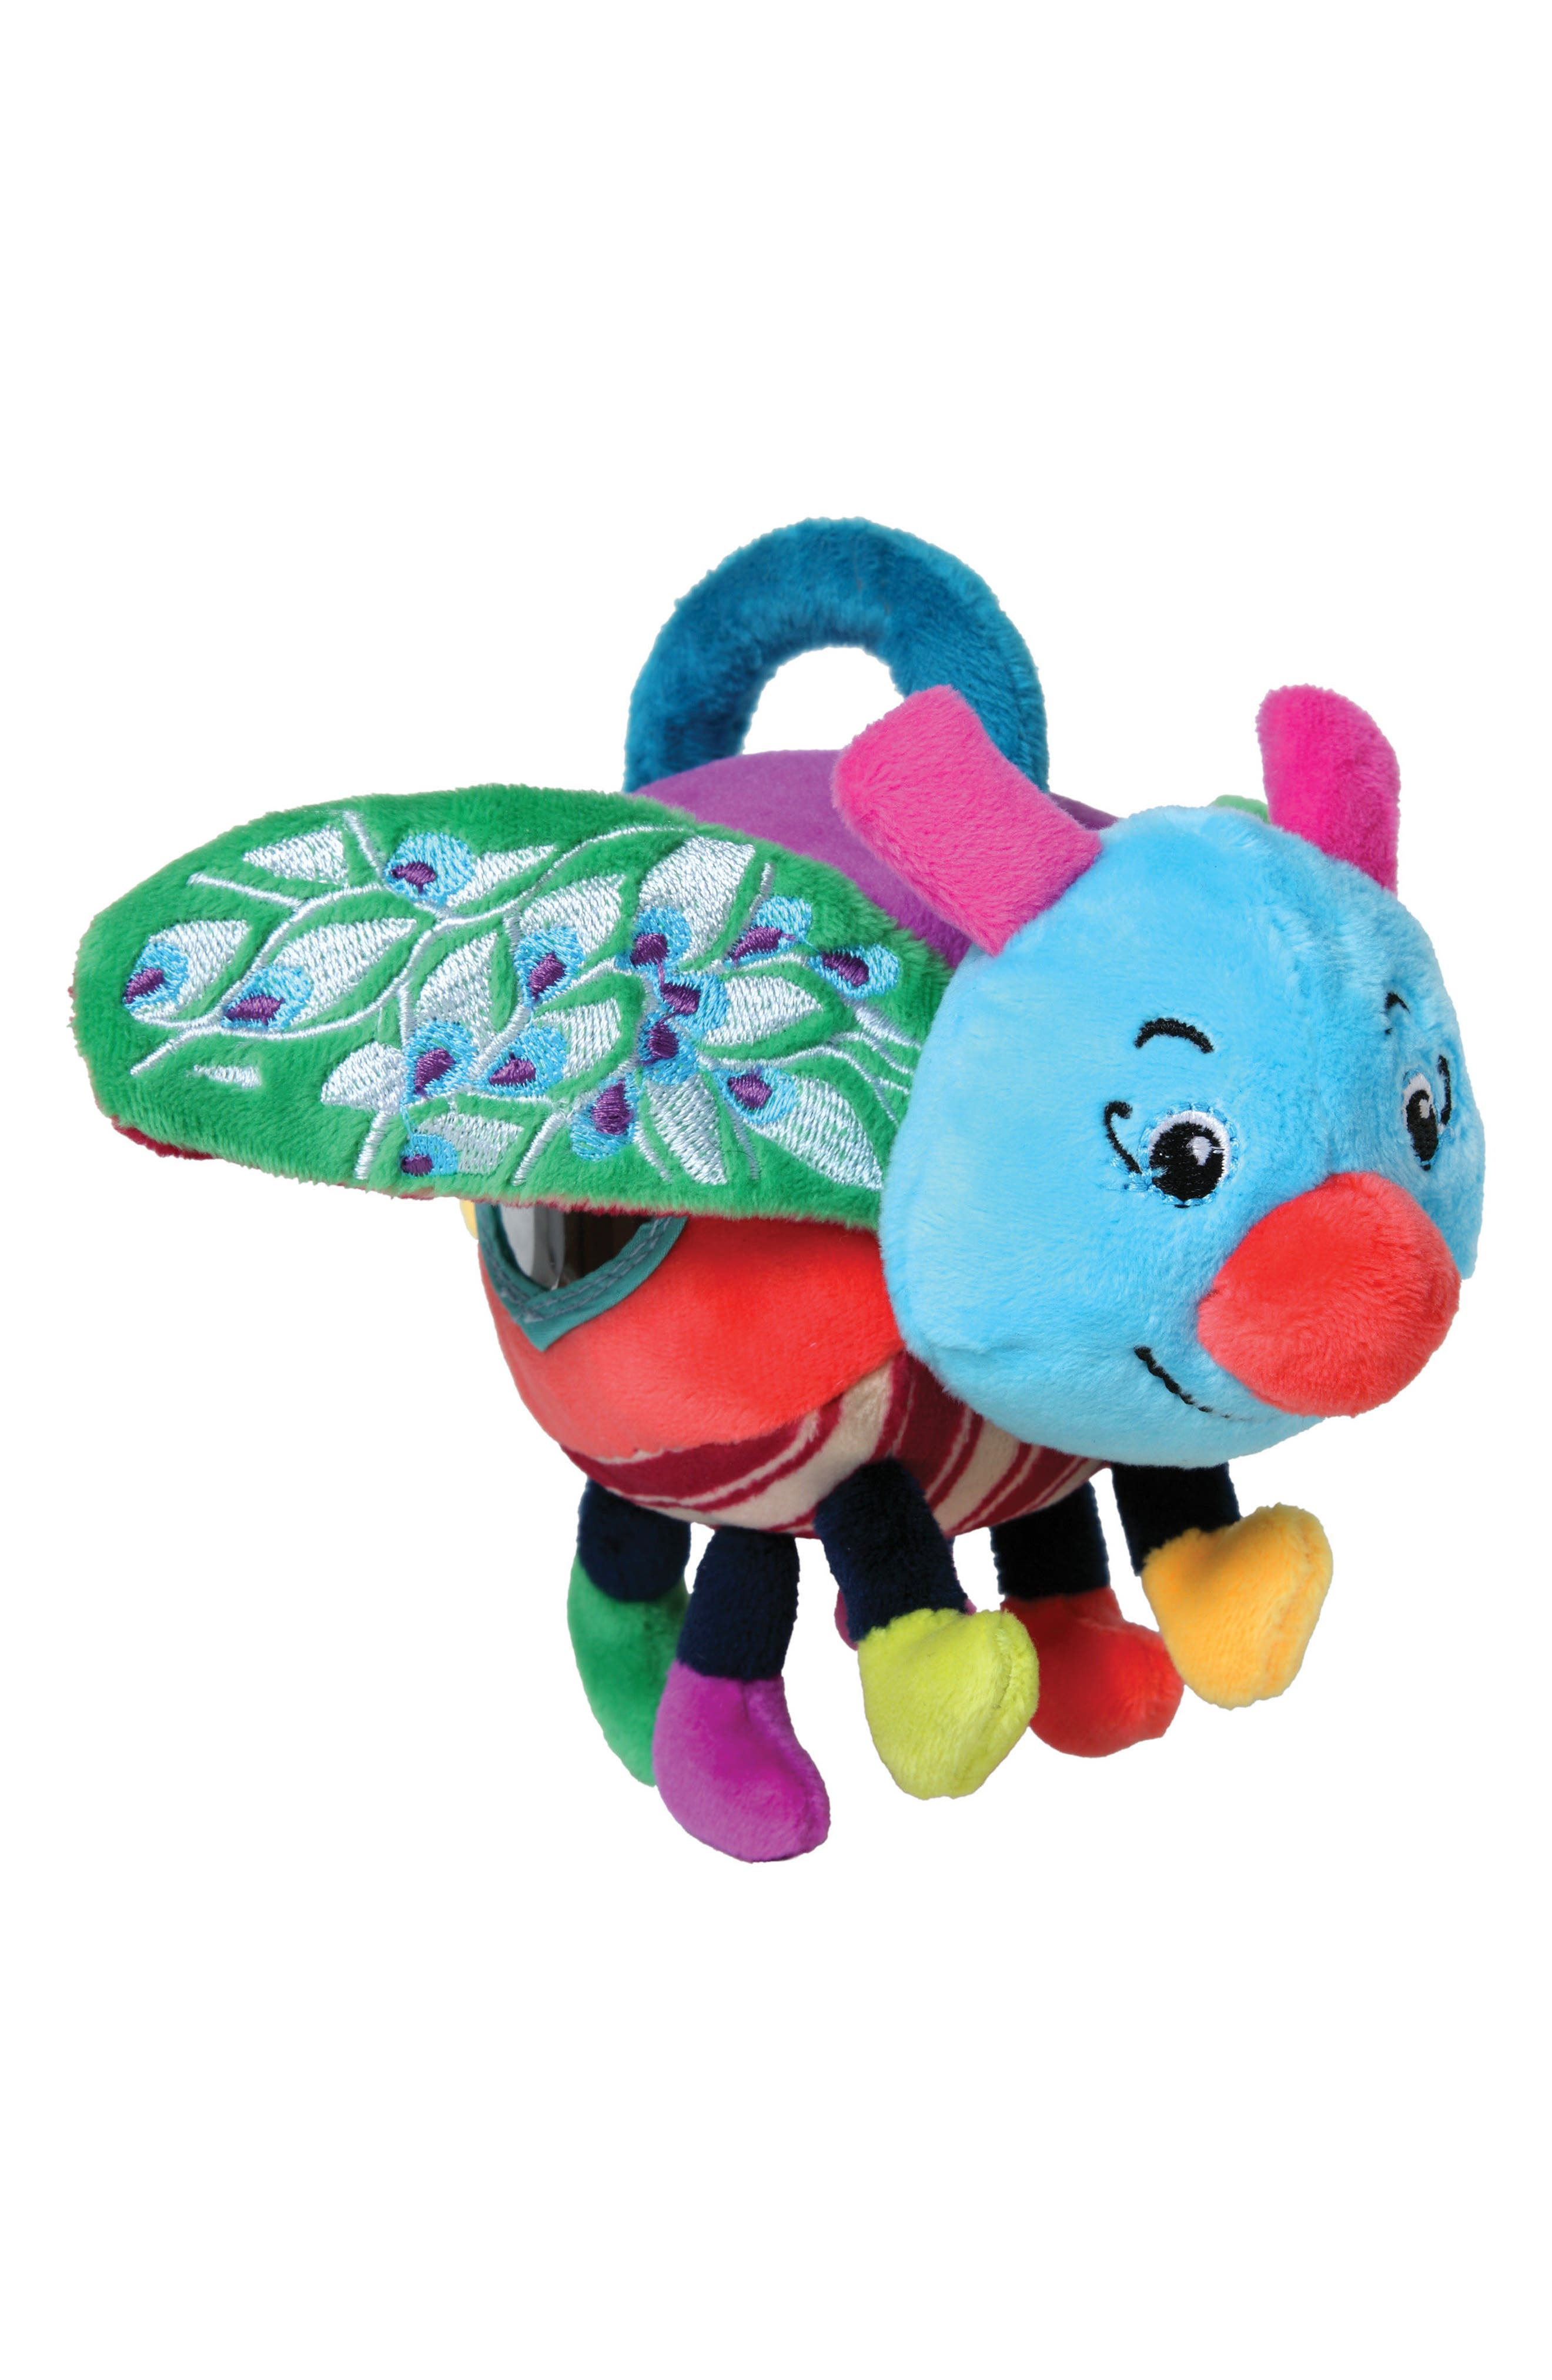 Noisy Bug Stuffed Toy,                         Main,                         color, Multi